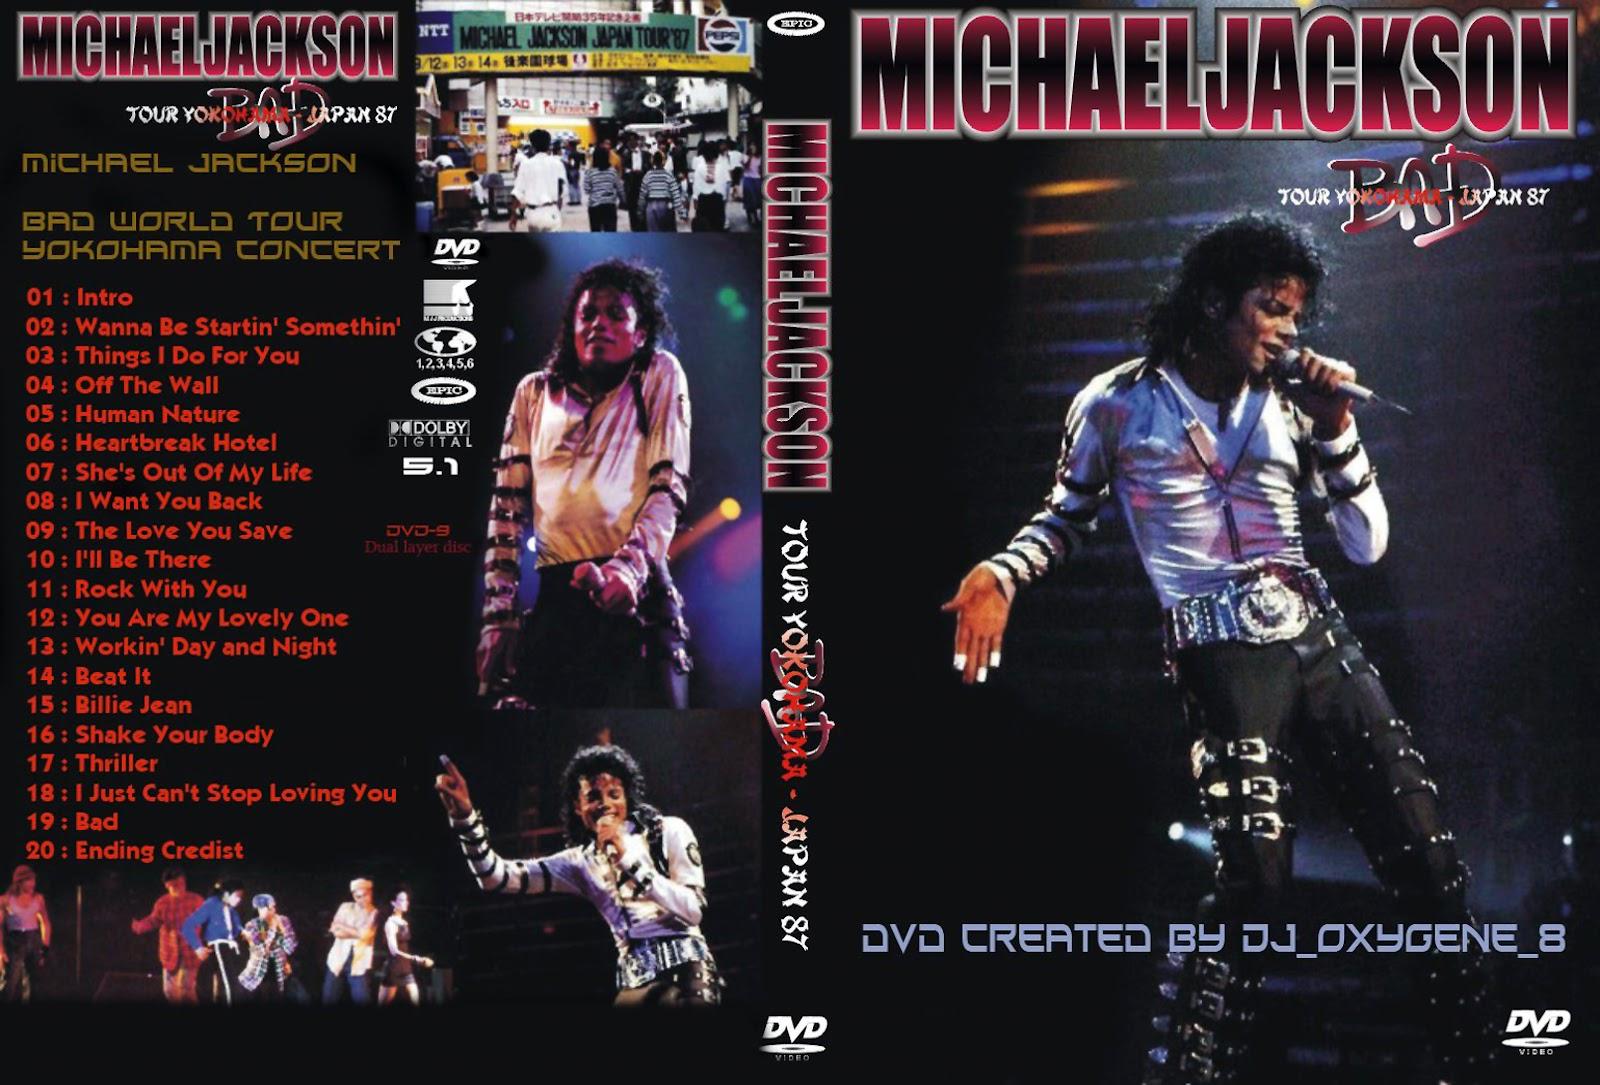 http://4.bp.blogspot.com/-0BvGQUHSKr0/T7iwJqjR8RI/AAAAAAAAIOY/1Pe_t0yFESY/s1600/Michael+Jackson+-+Bad+Tour+Yokohama+87+-+Cover.jpg